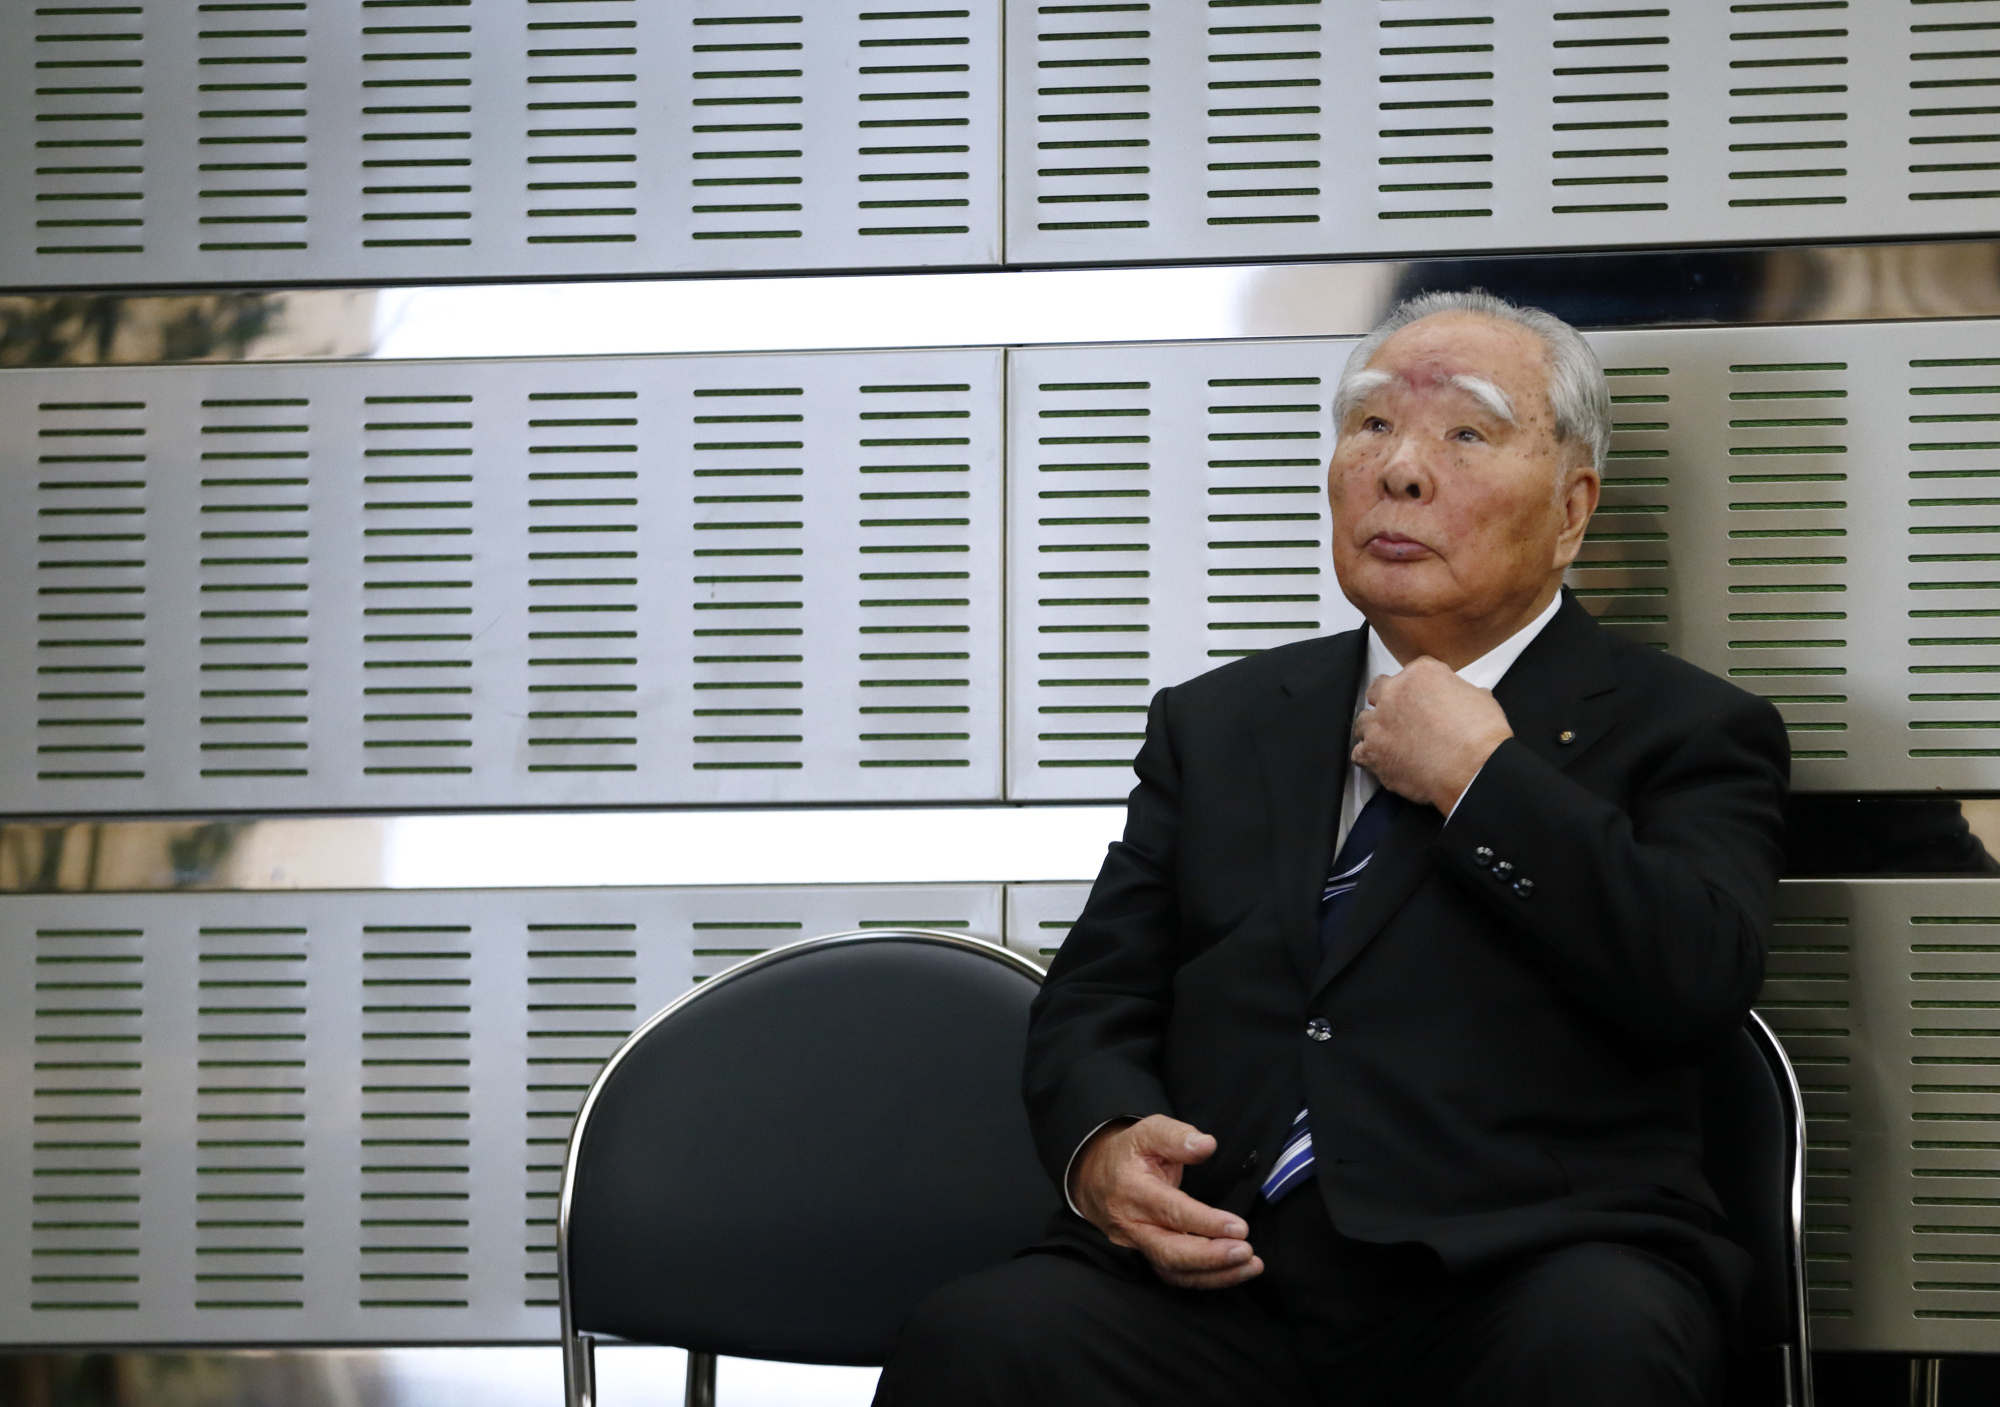 Suzuki: O 91χρονος πρόεδρος της εταιρείας παραιτείται μετά από μισό αιώνα στο τιμόνι της!